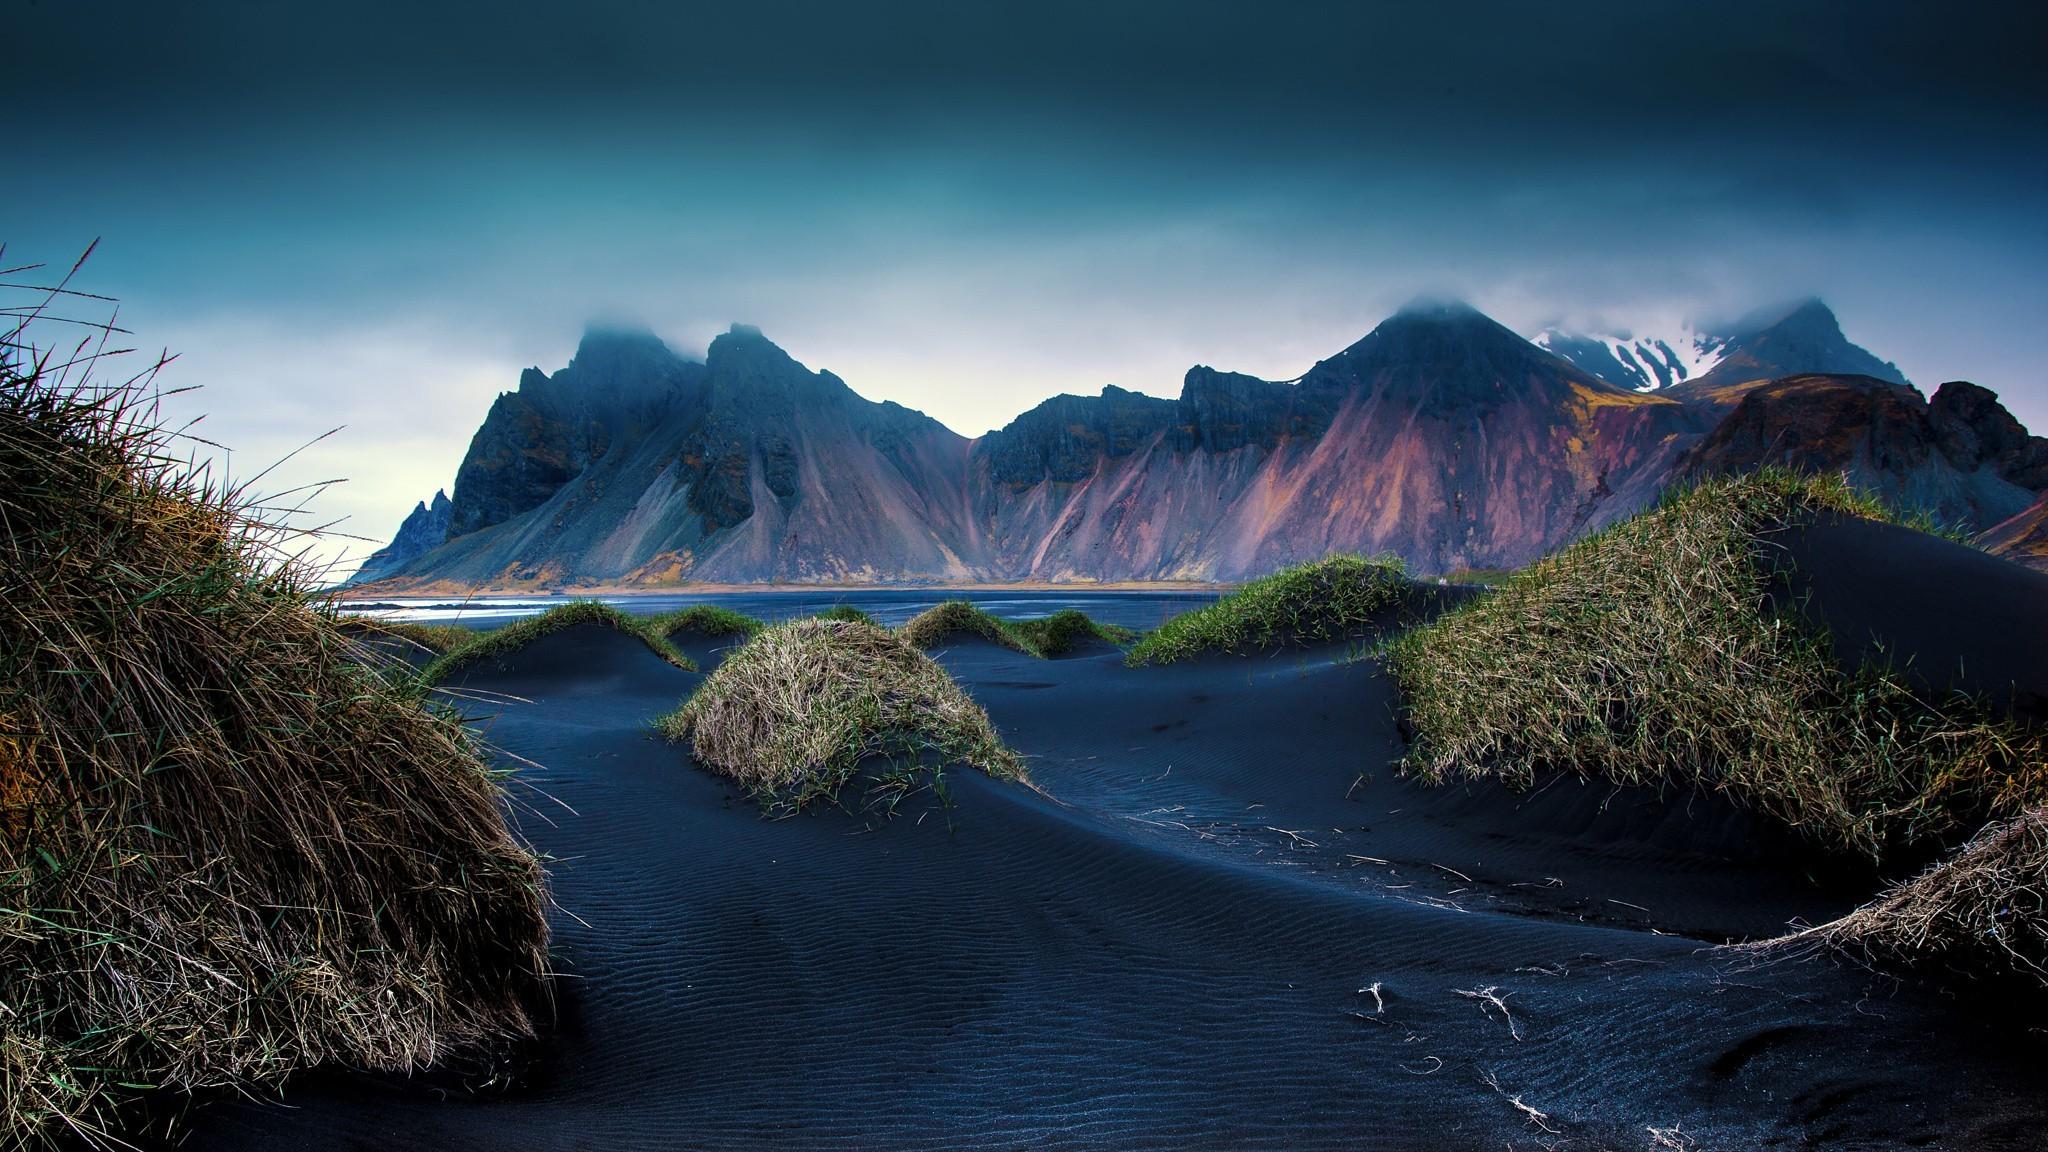 Cool Wallpaper Mountain Beach - 2048x1152-px-beach-black-cliff-clouds-dune-grass-Iceland-landscape-mountain-nature-sand-1077191  Photograph_735223.jpg